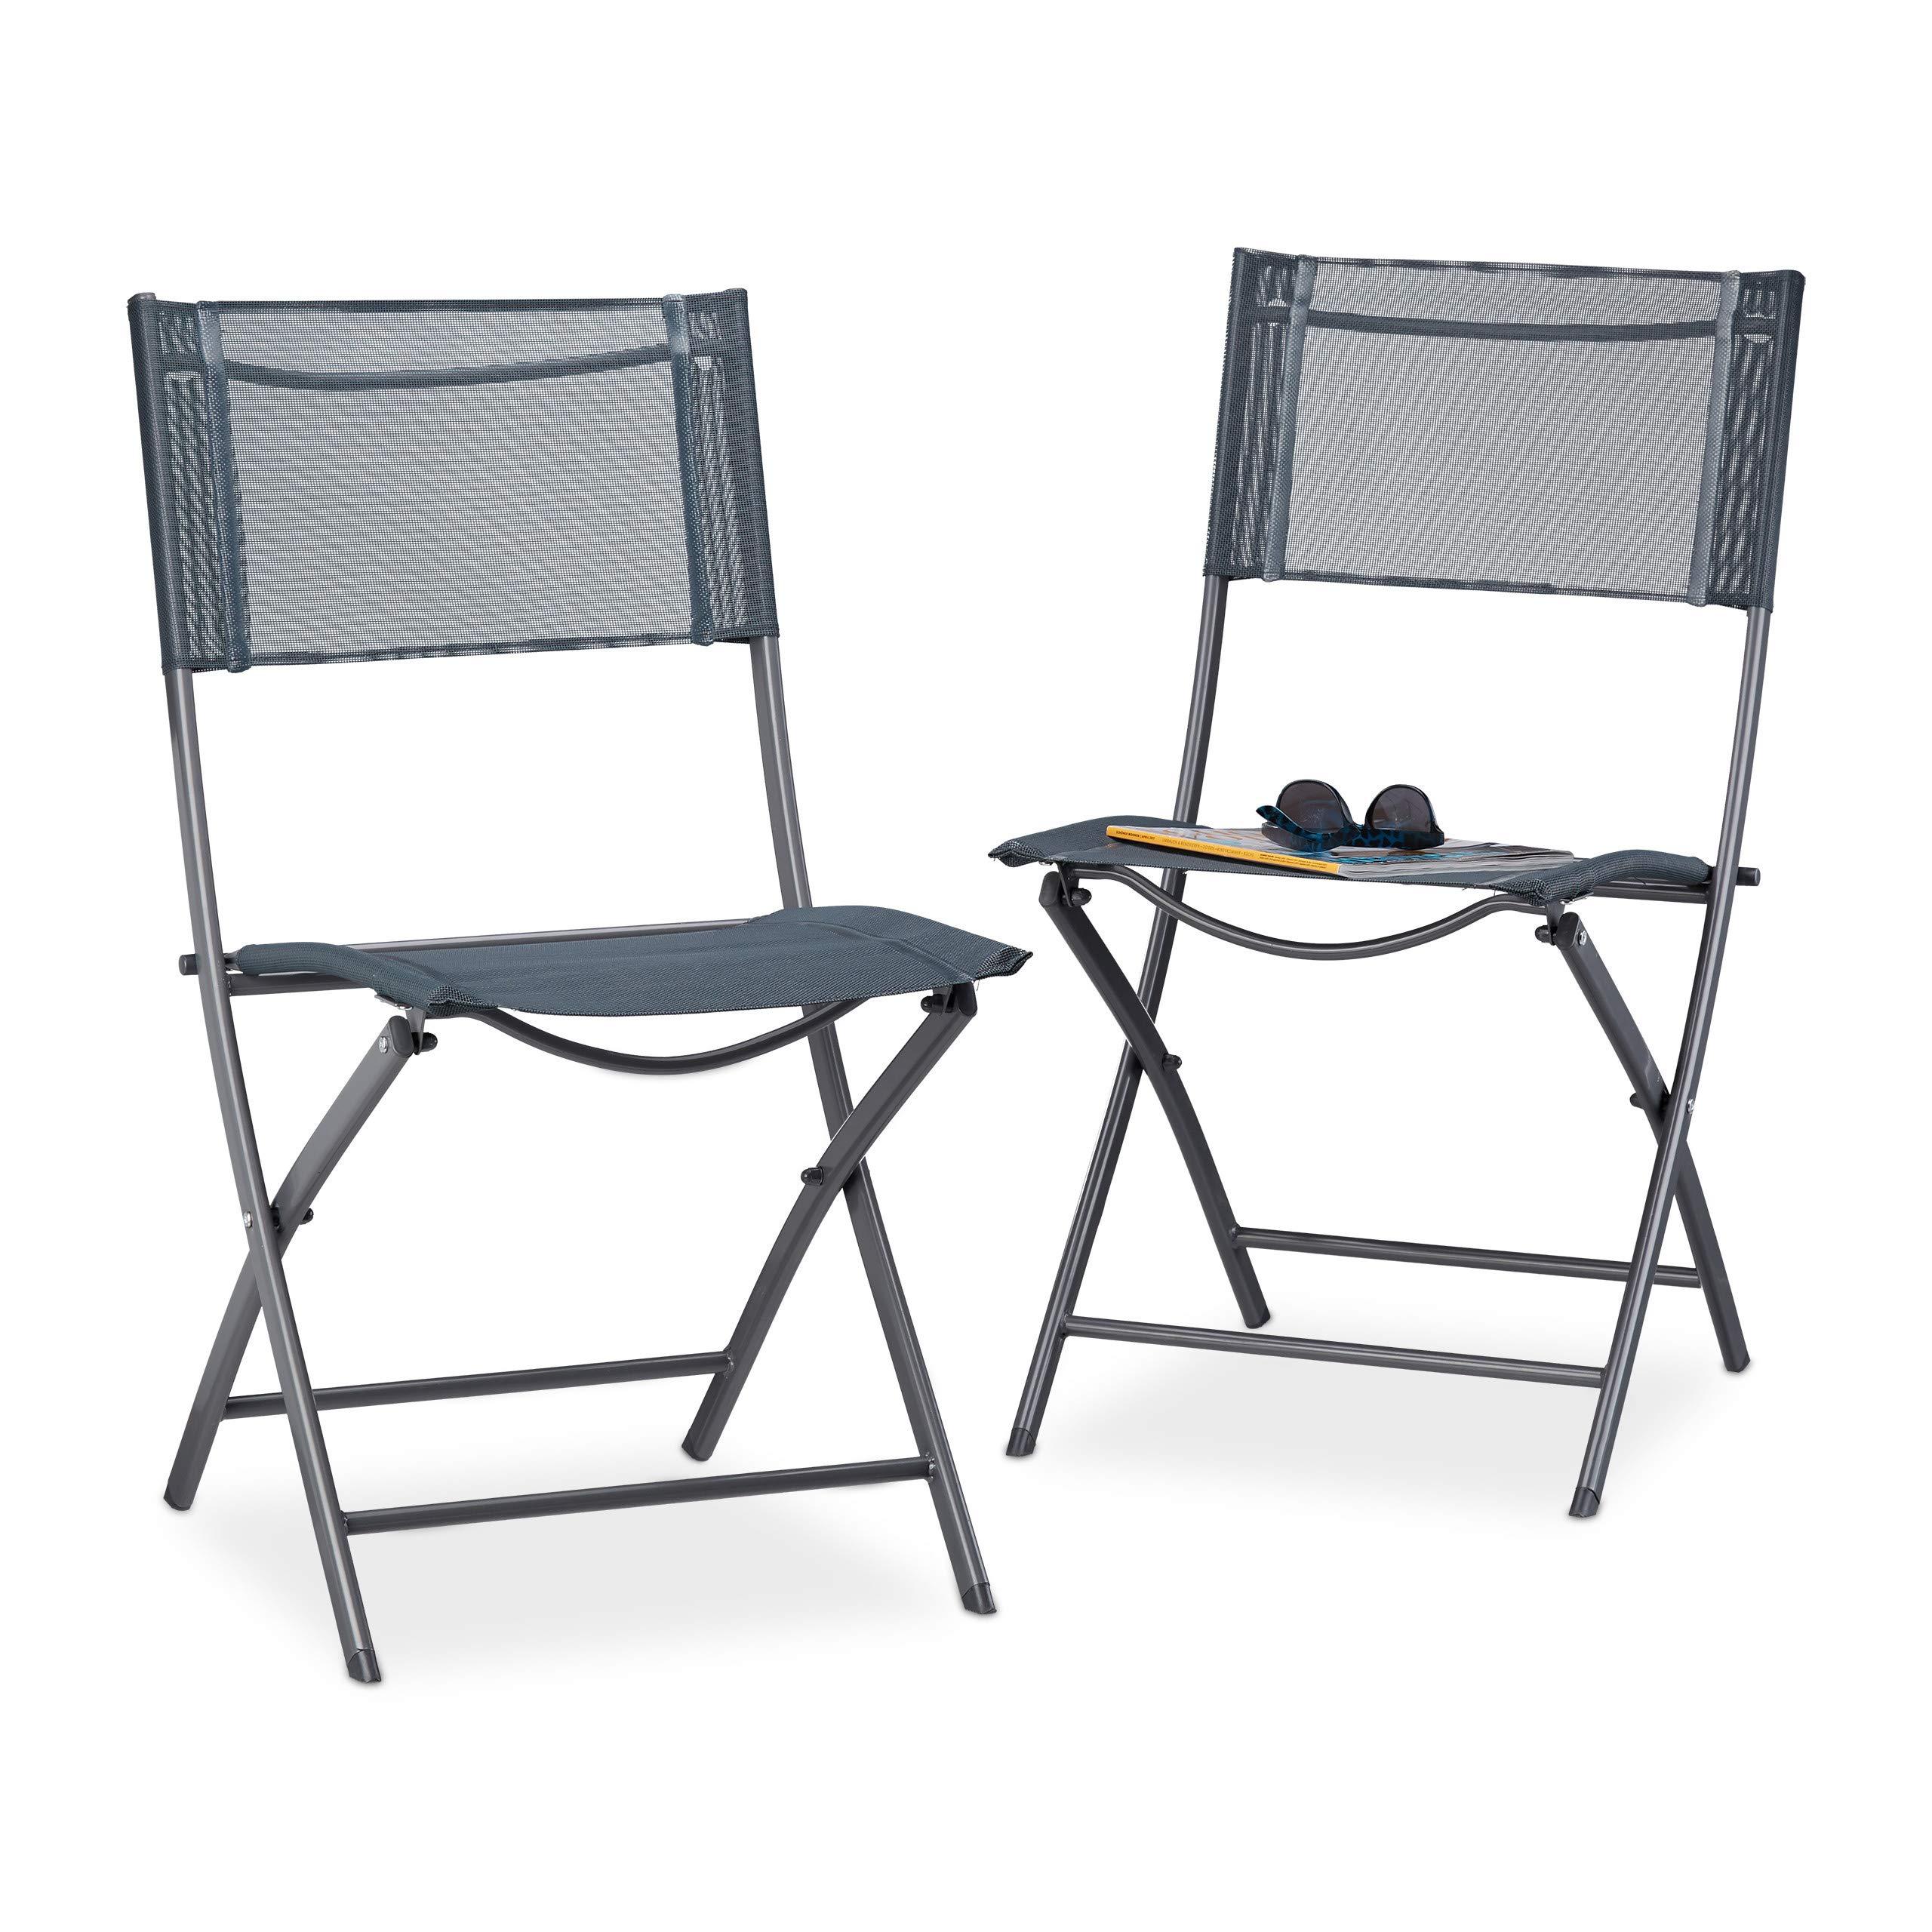 Relaxdays Set of 9 Folding Balcony Chairs, Metal, Plastic, Garden Chairs,  HxWxD: 9 x 9 x 9 cm, Foldable, Grey